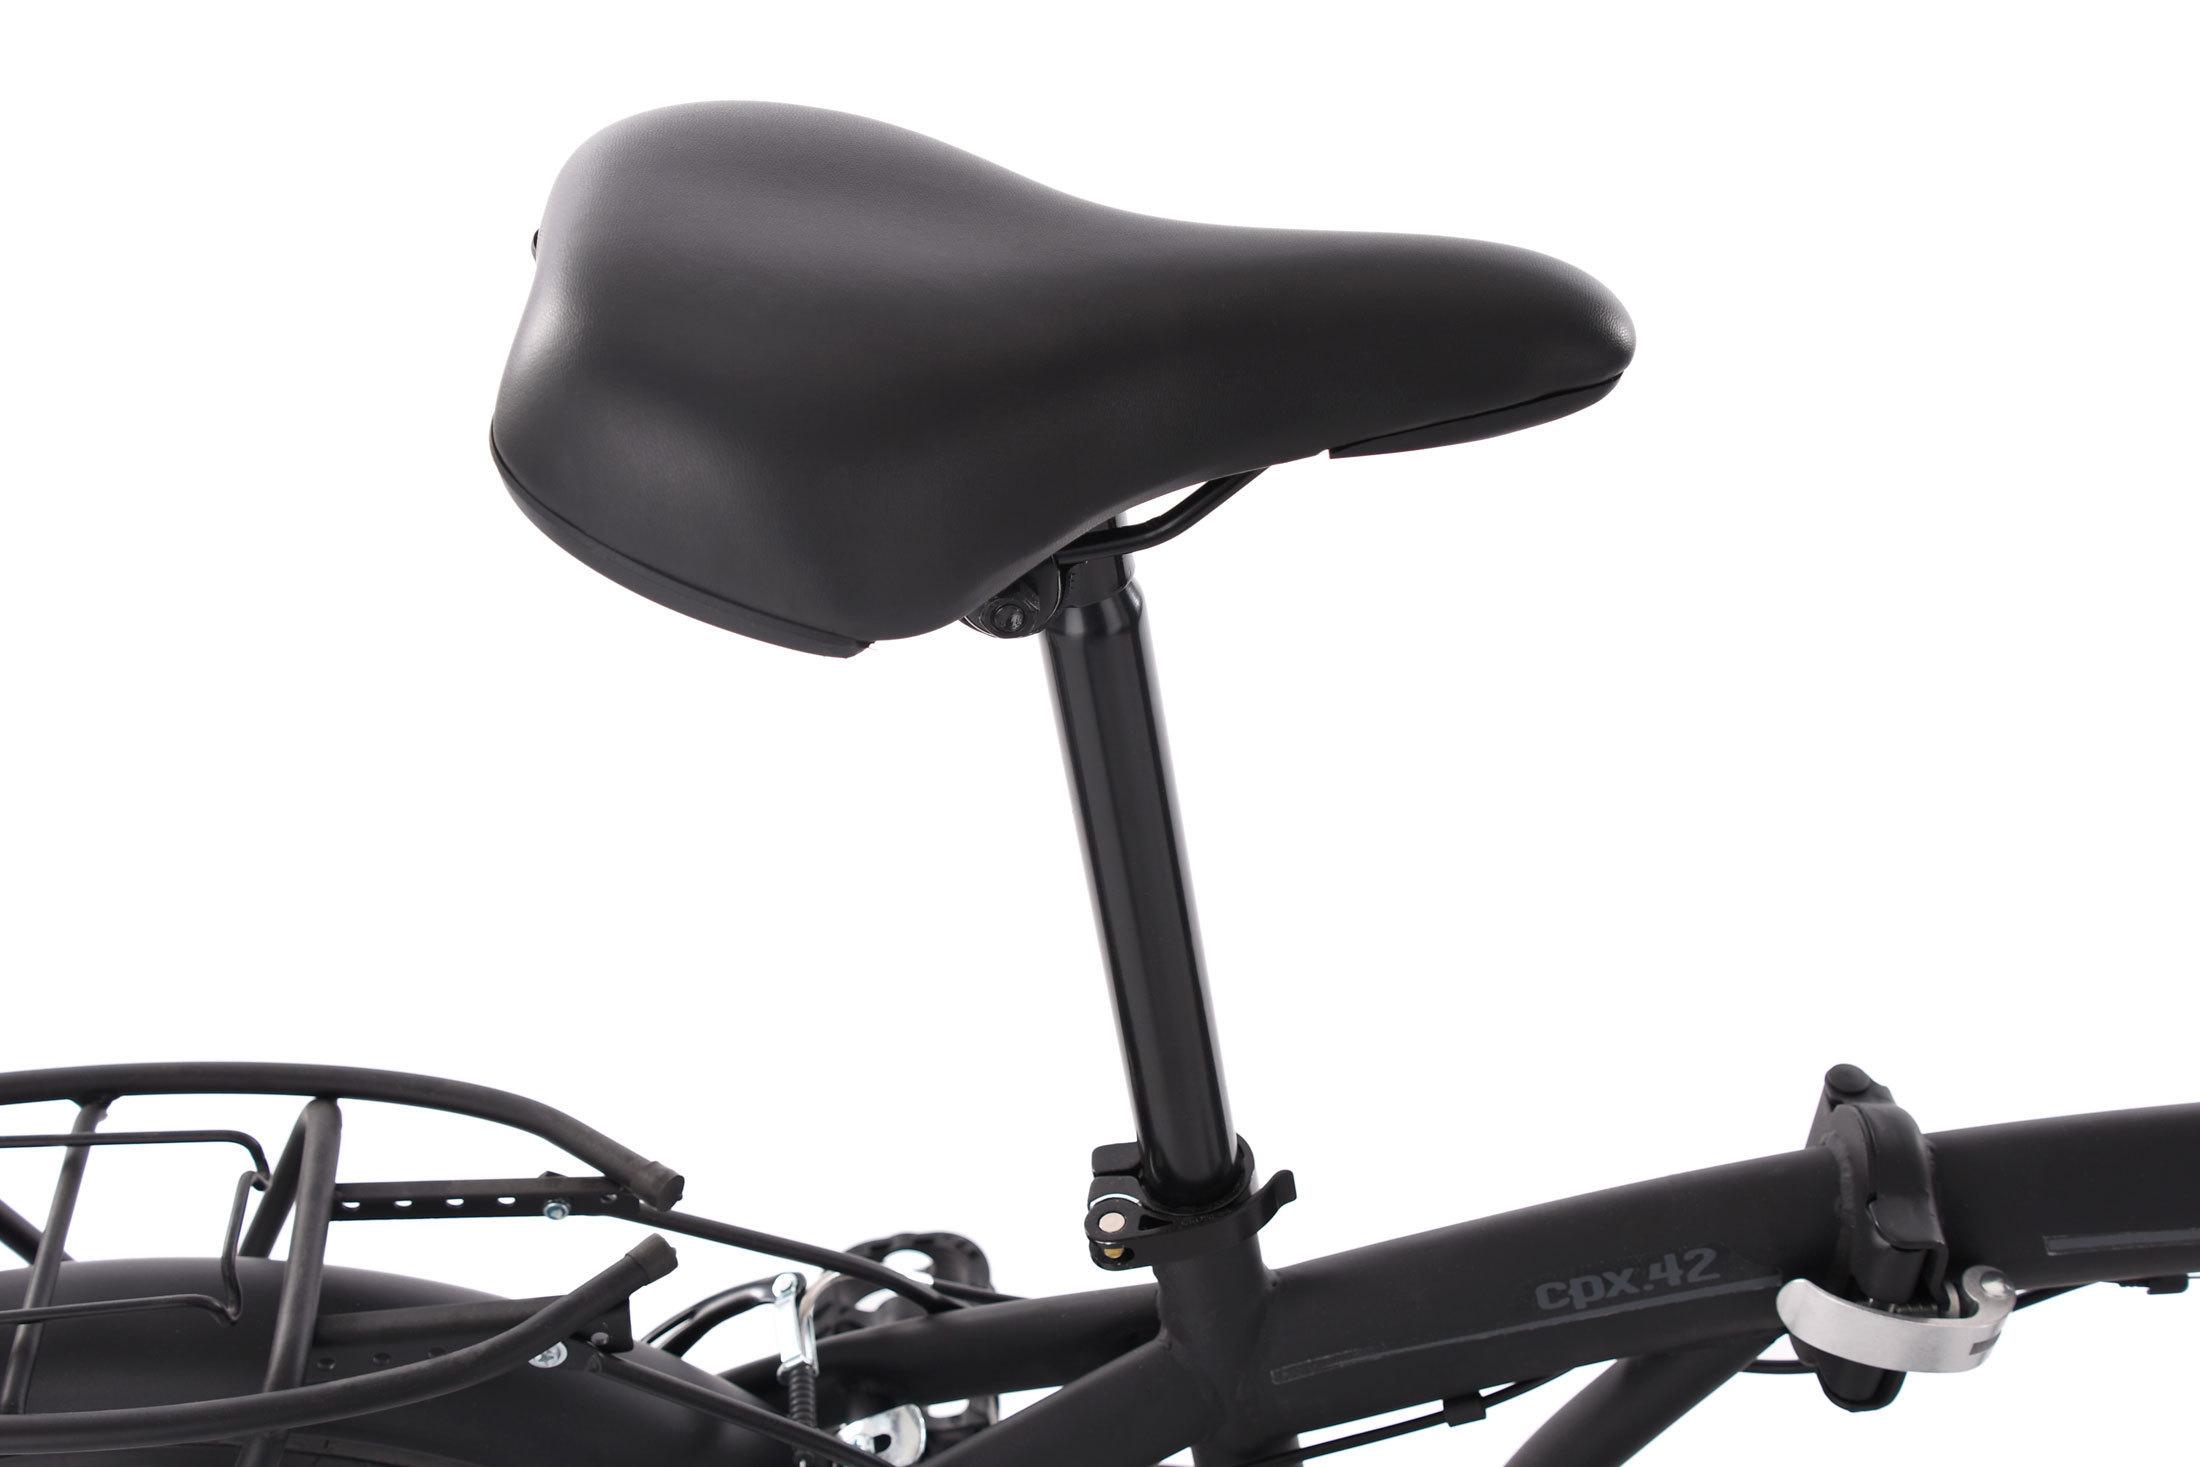 KS Cycling Faltrad Cityfold Fahrrad 20 KSCA5|#KS Cycling 134C schwarz